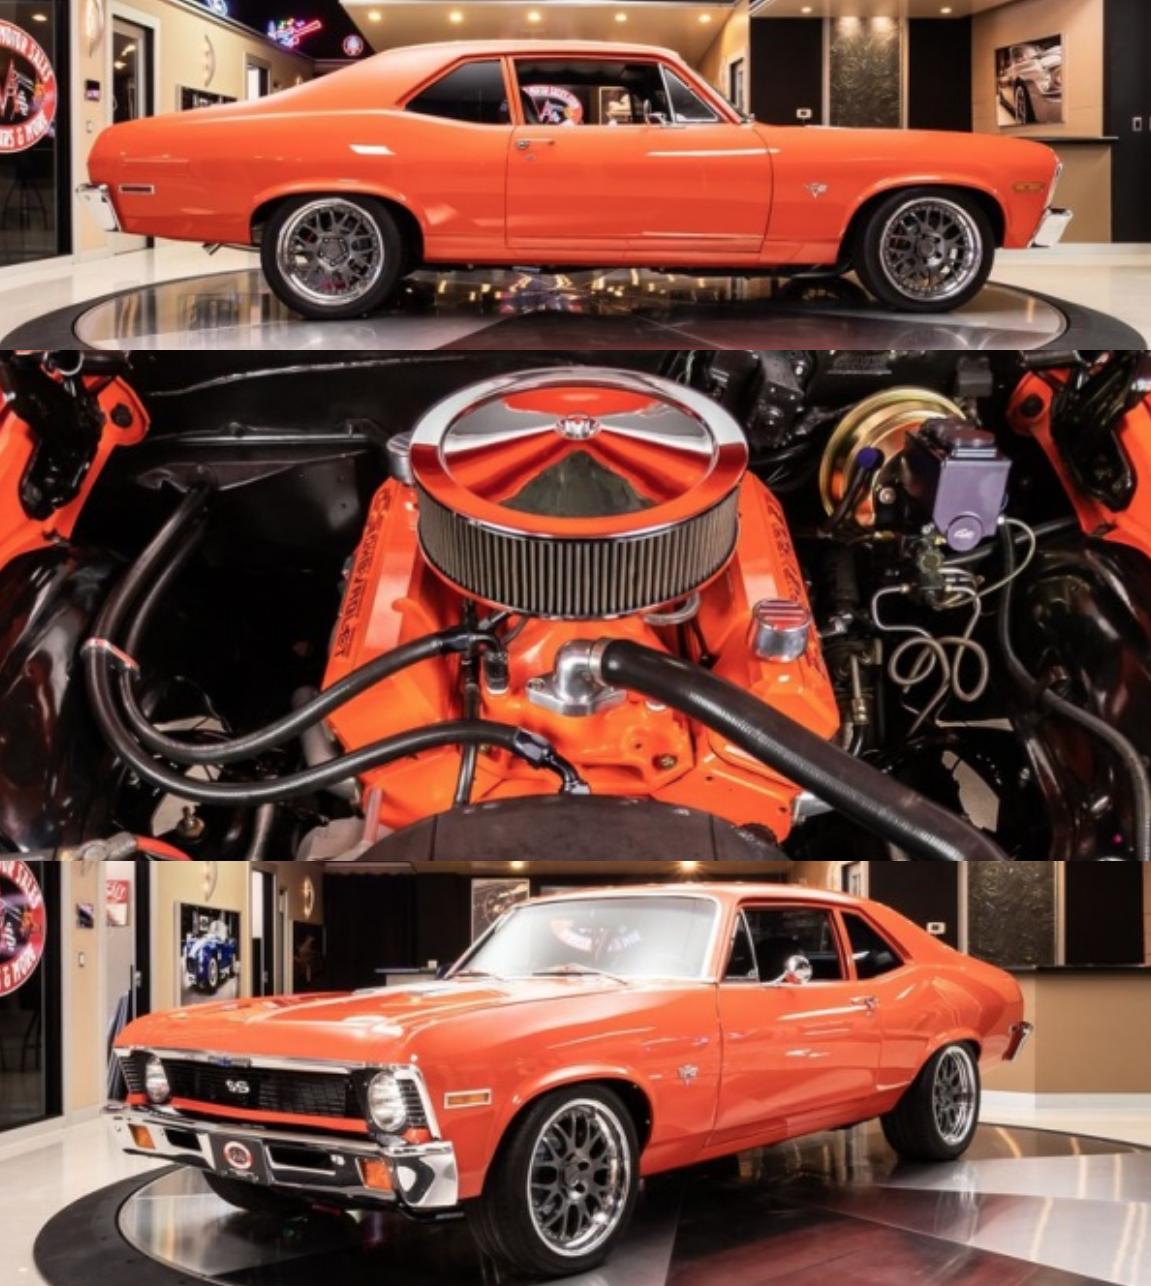 1972 Chevrolet Nova In 2020 Chevrolet Nova Chevy Muscle Cars Dream Cars